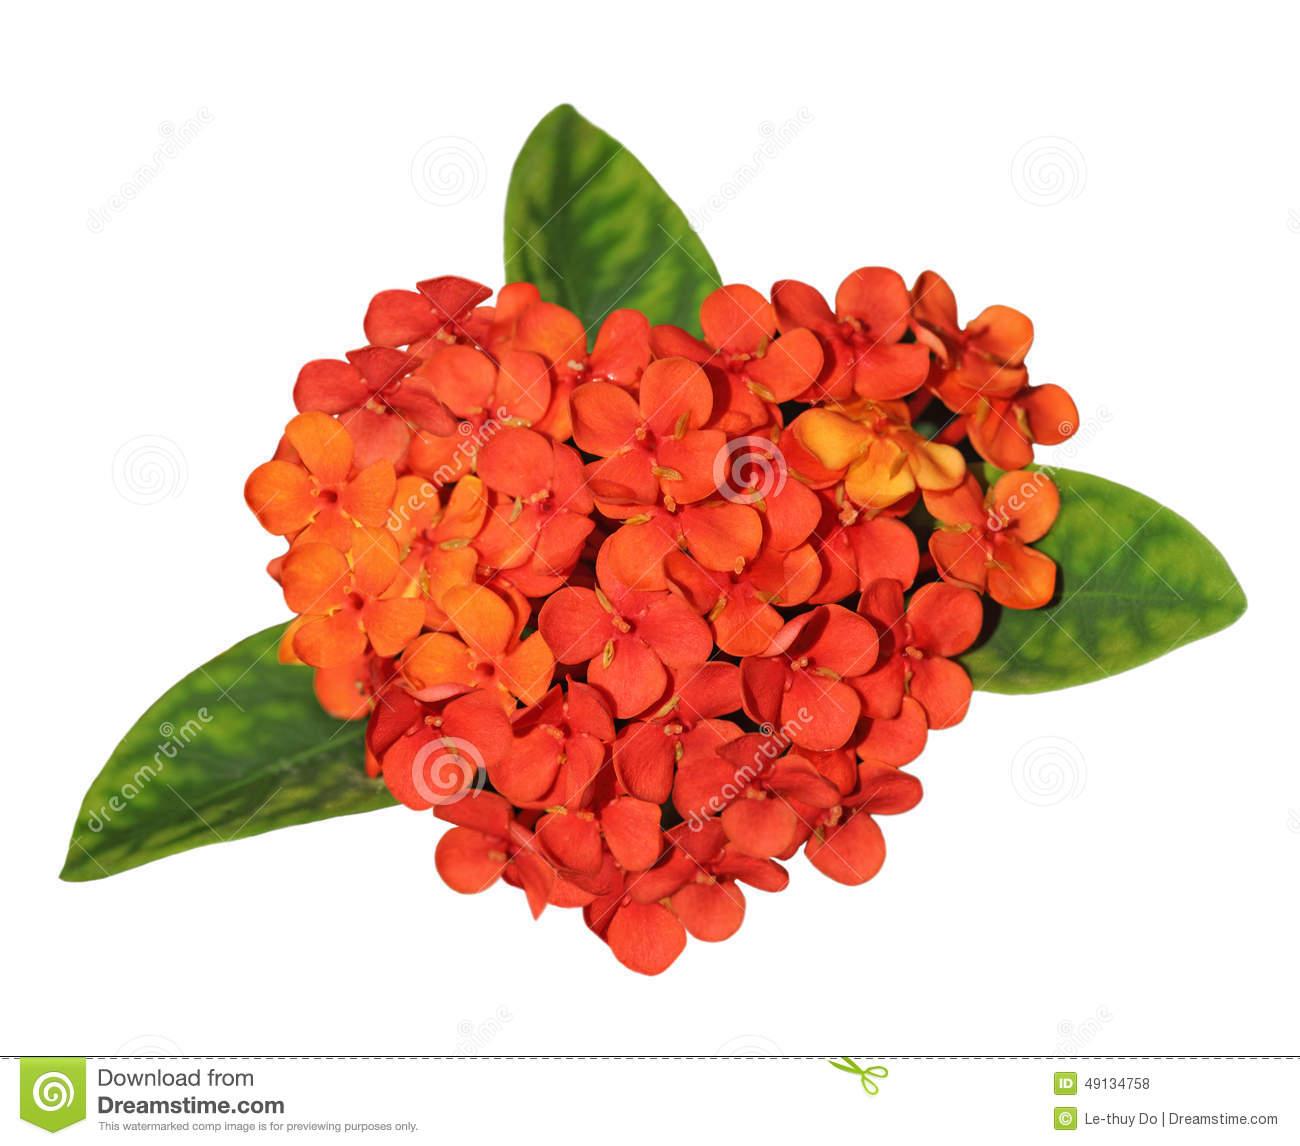 Ixora Coccinea Flower Stock Photo.